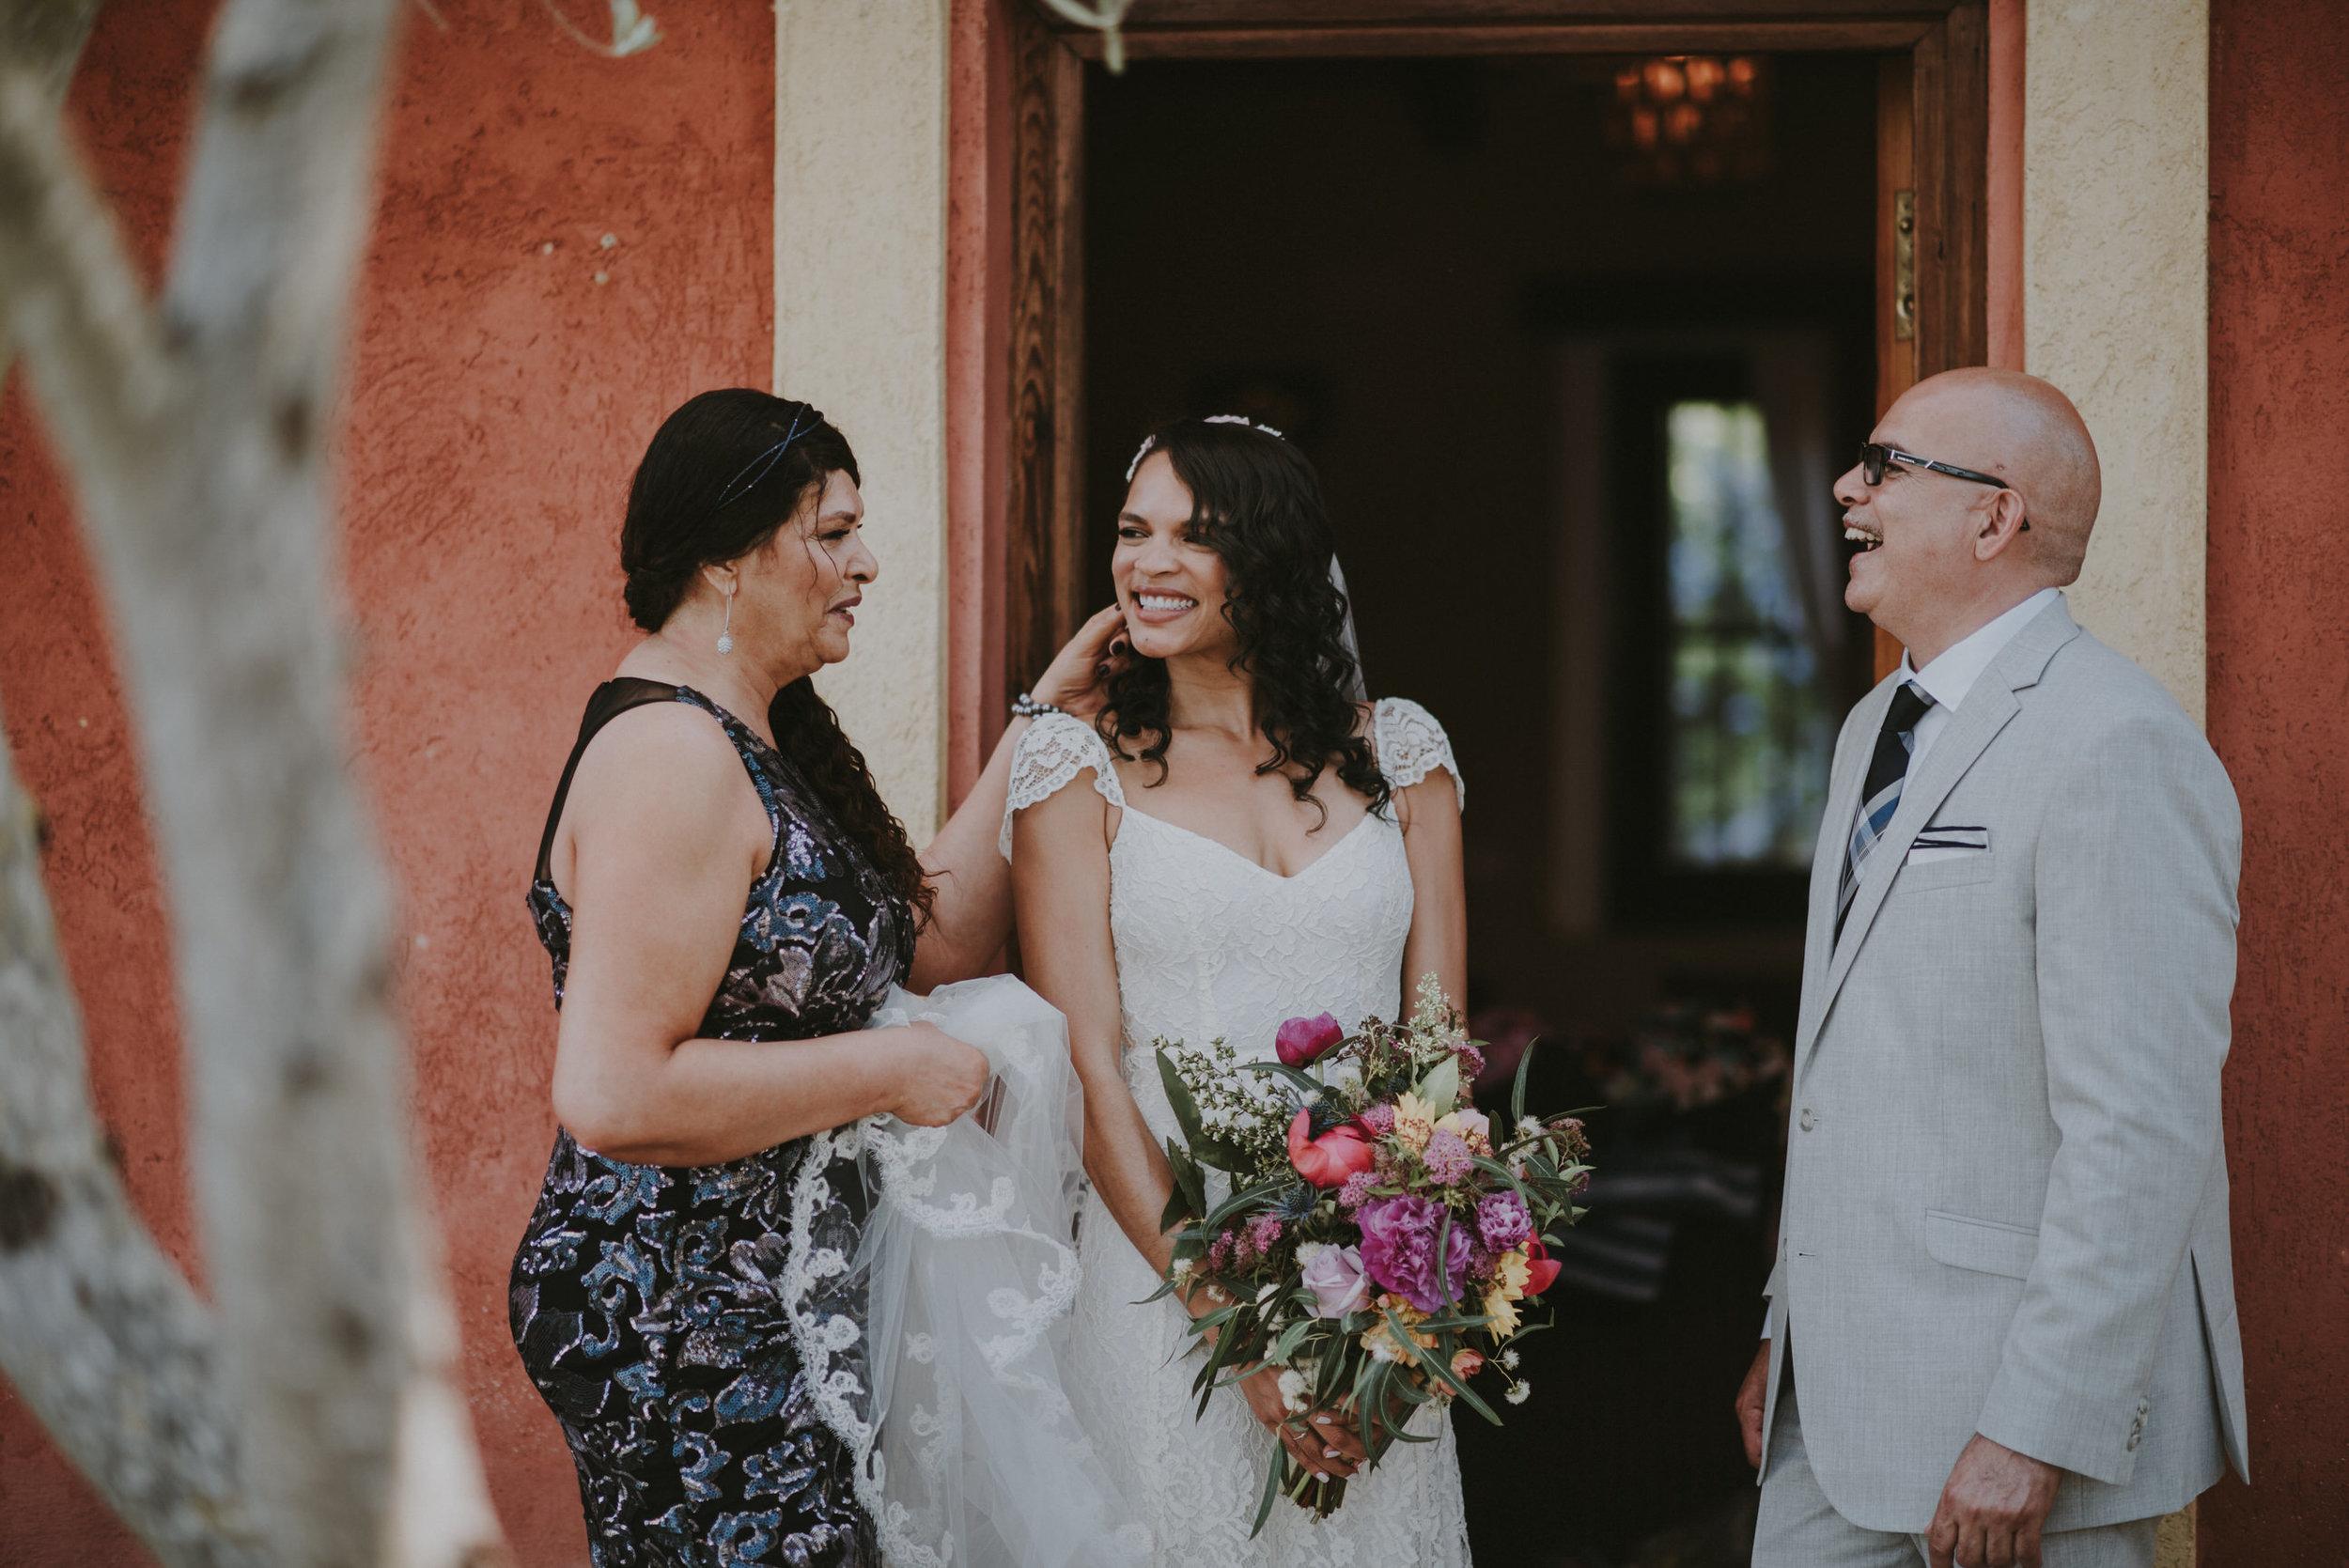 Andres+Amarillo+fotografo+boda+sevilla+natural+sin+poses+hacienda+san+rafael (54).JPG